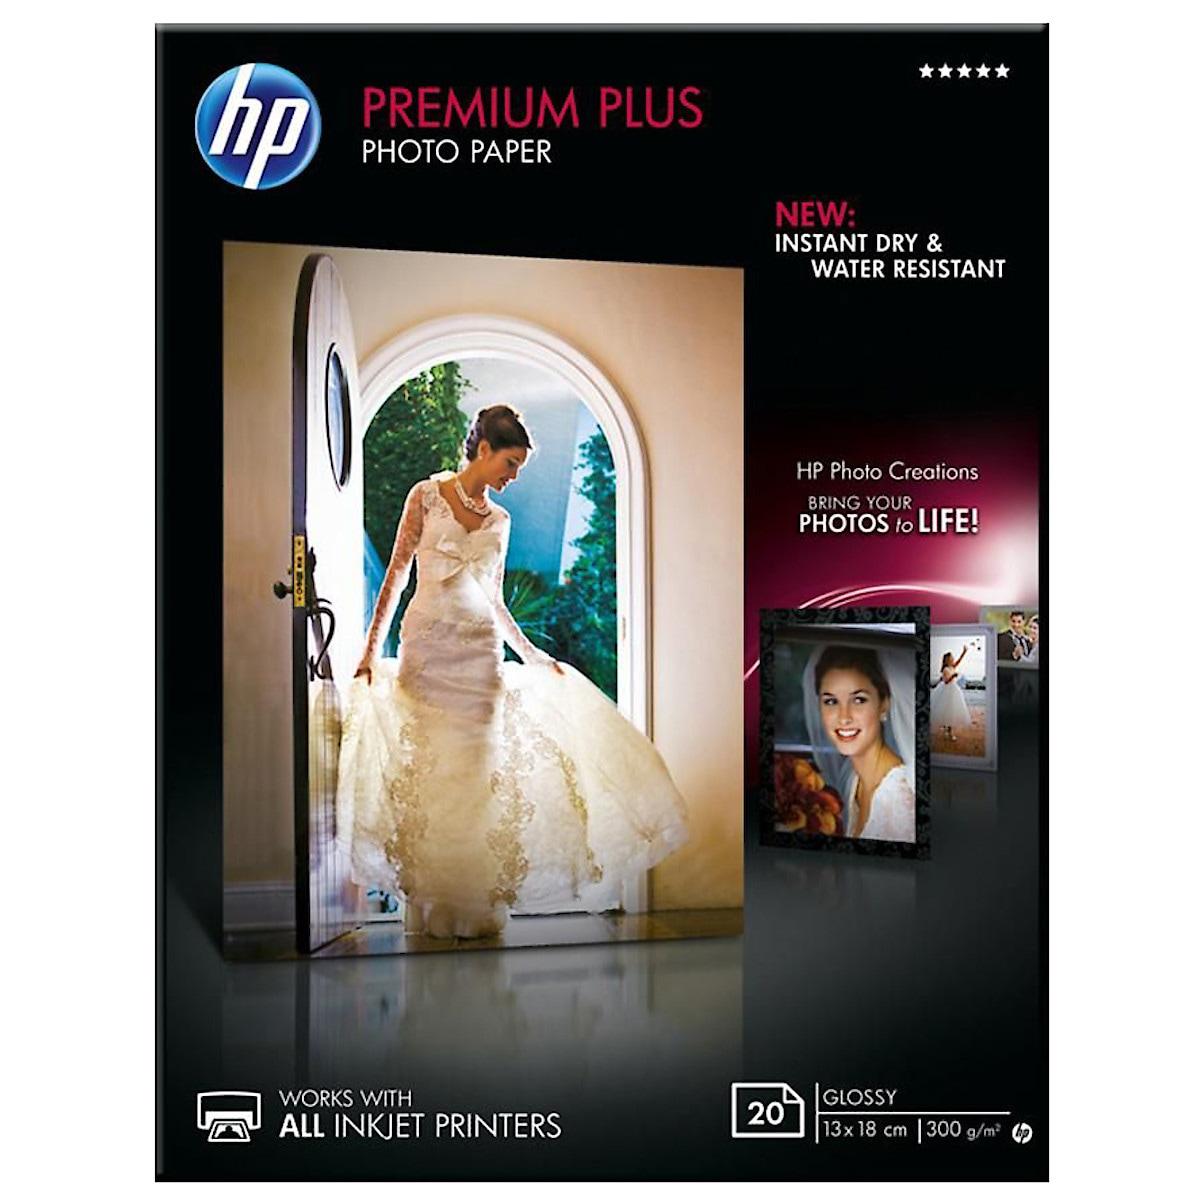 Fotopapier HP 13x18 cm HP Premium Plus Glossy